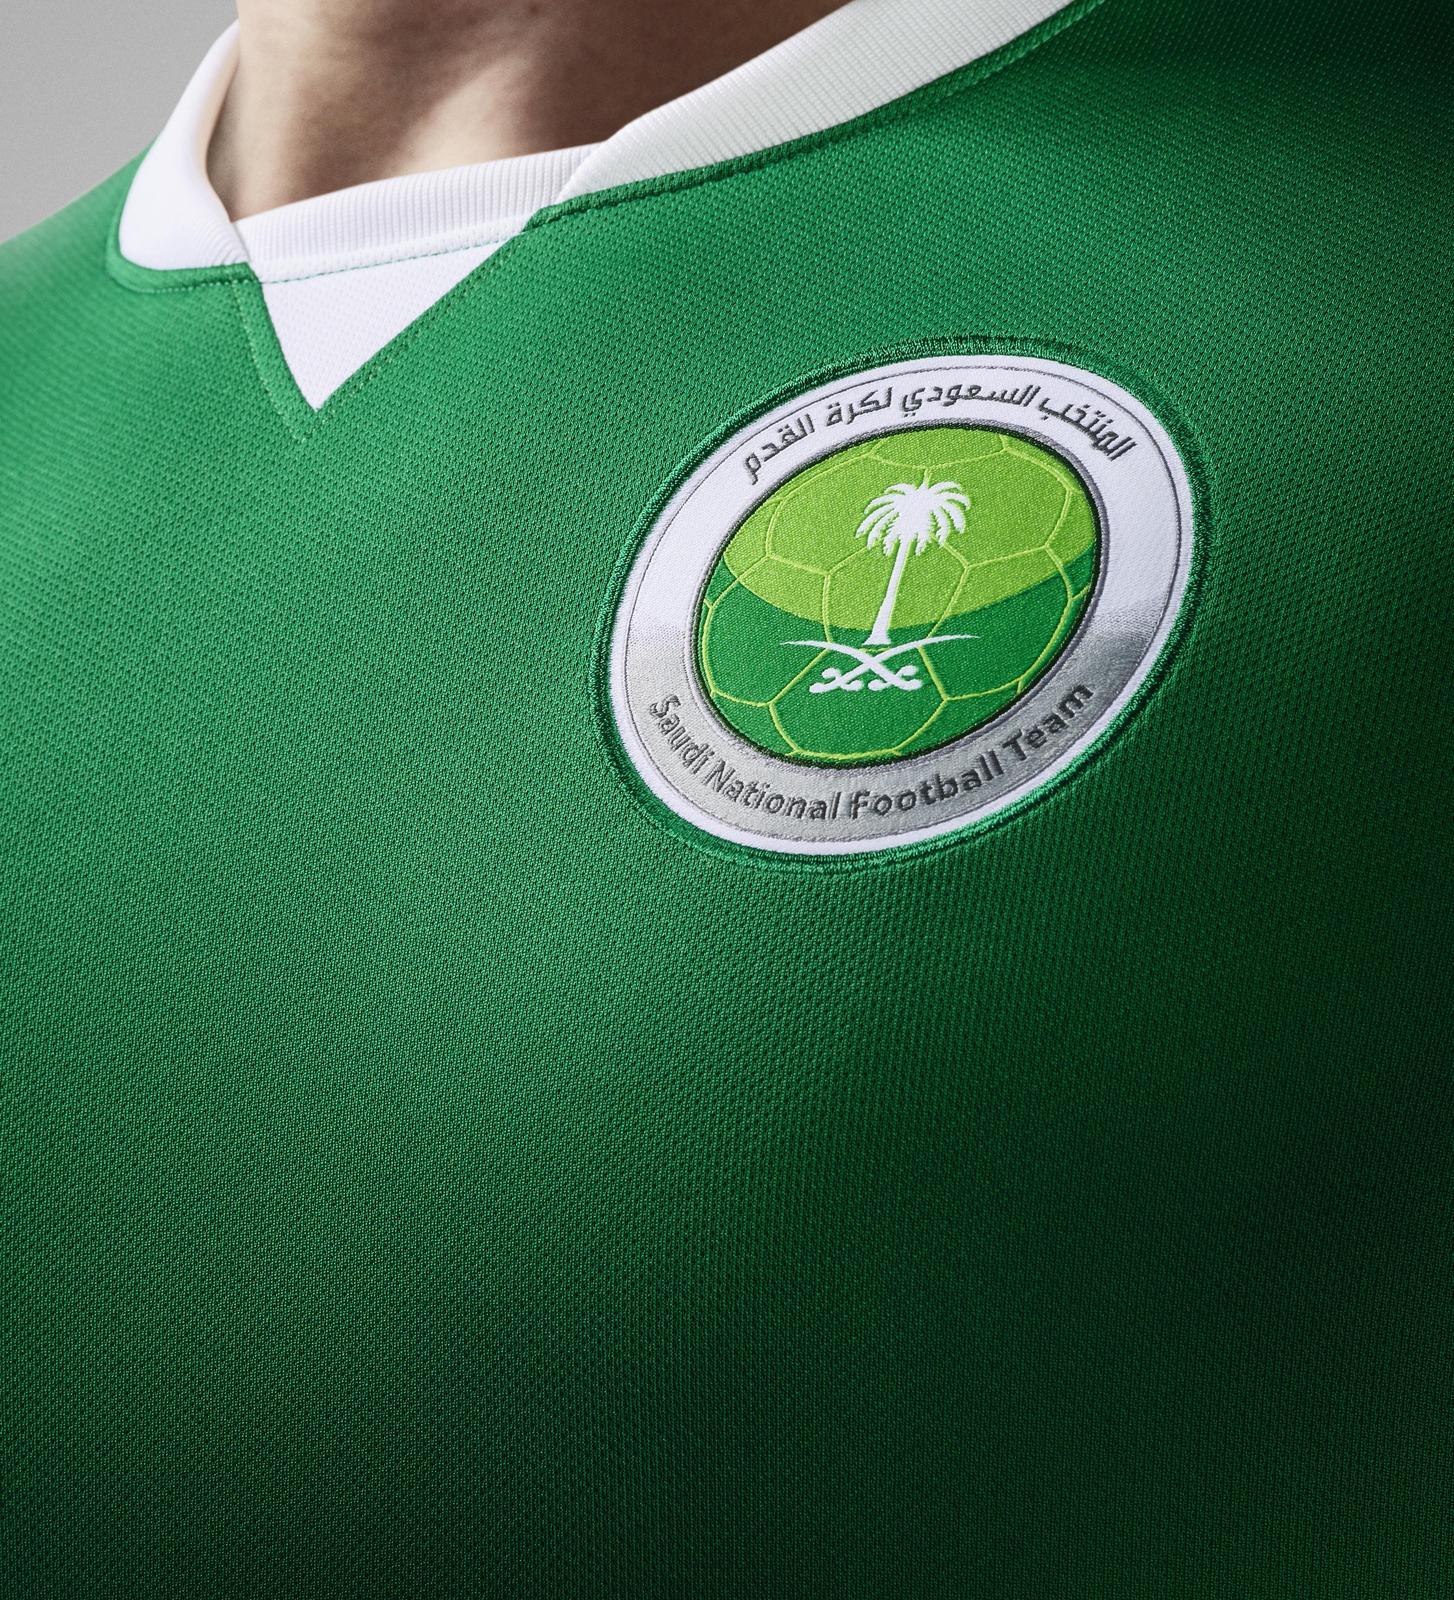 Nike jacket in saudi arabia -  Mobile Gallery Image Mobile Gallery Image Close Nike Home Kit For Saudi Arabia